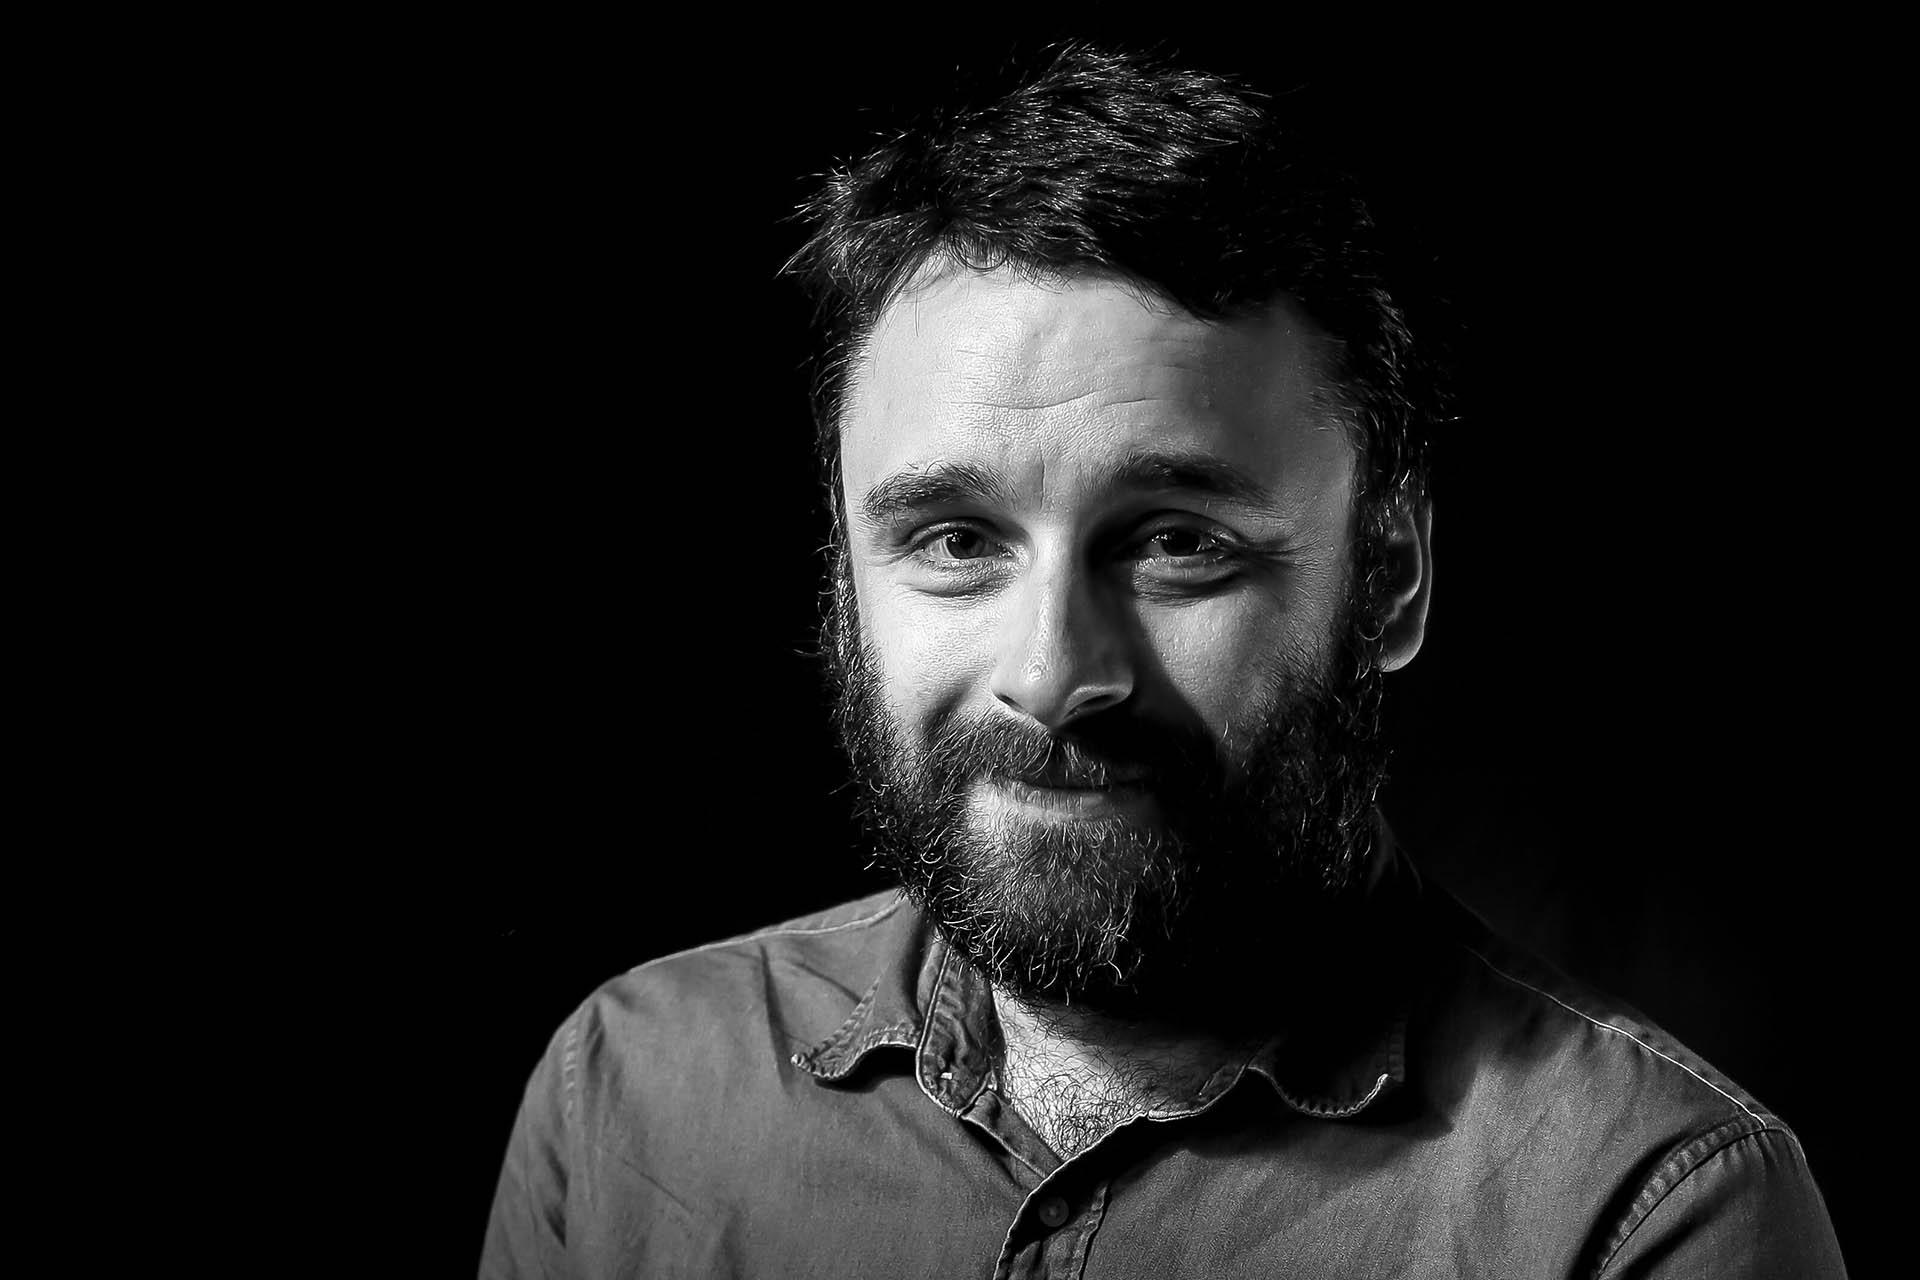 Ryan Payton - Founder of Camoflaj Studio